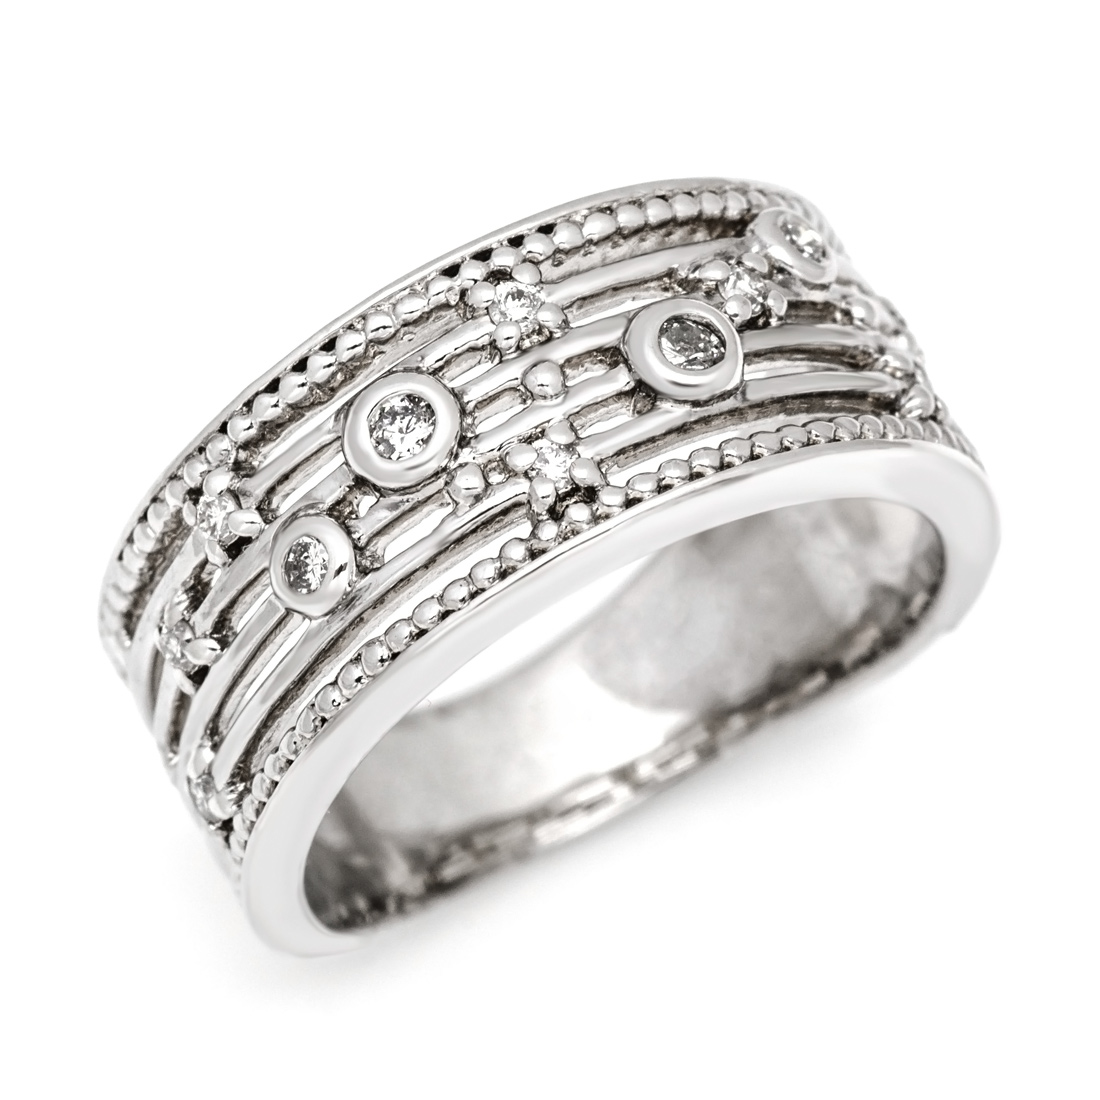 【GWクーポン配布中】K18 ダイヤモンド リング 「melodia」送料無料 指輪 ダイアモンド ゴールド 18K 18金 誕生日 4月誕生石 刻印 文字入れ メッセージ ギフト 贈り物 ピンキーリング対応可能